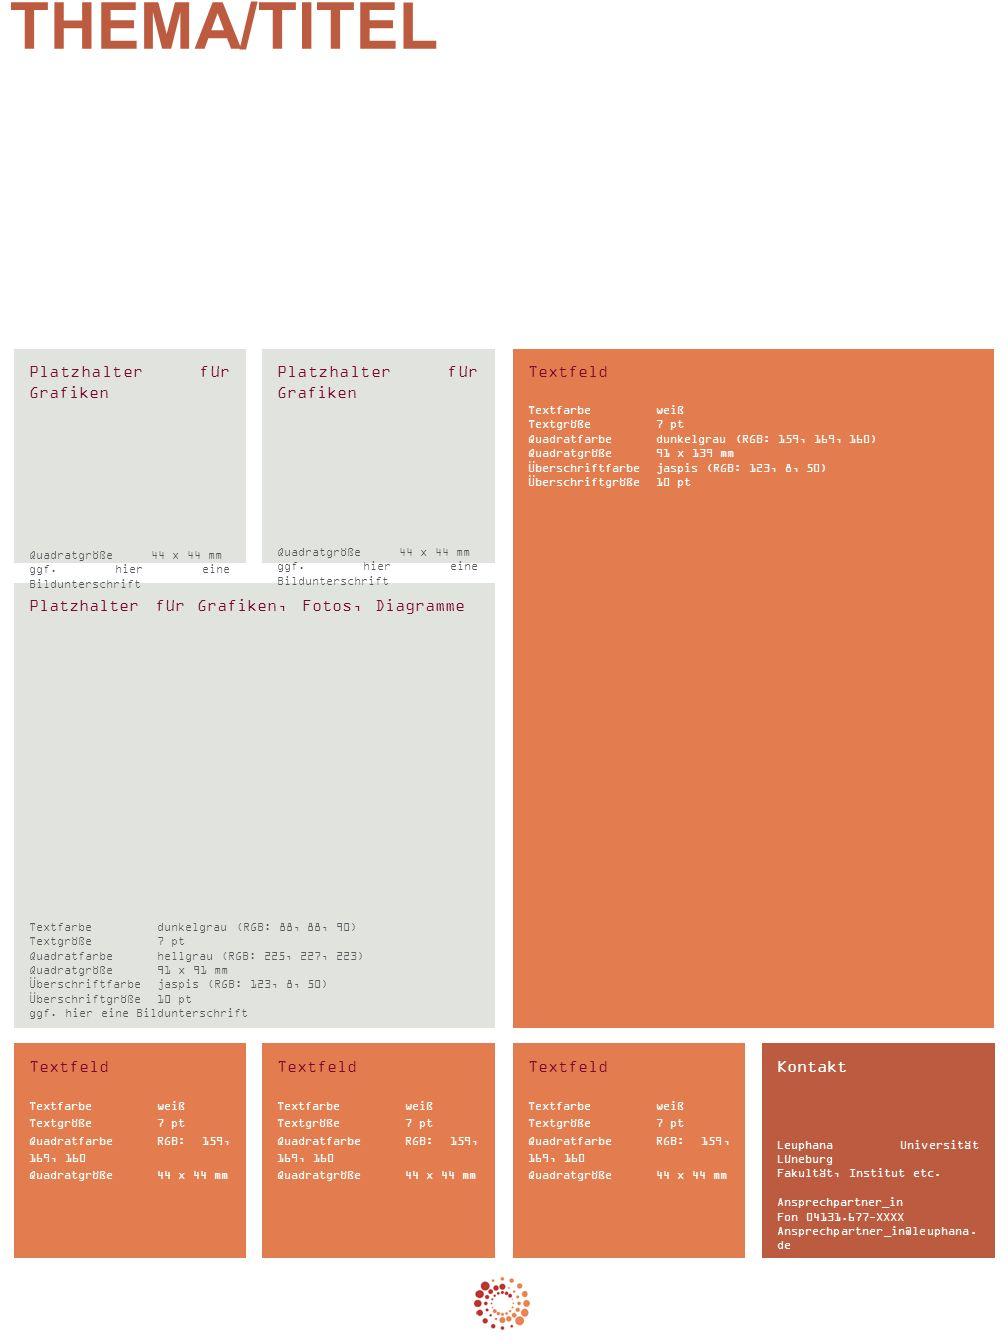 Textfeld Textfarbeweiß Textgröße 7 pt Quadratfarbedunkelgrau (RGB: 159, 169, 160) Quadratgröße91 x 139 mm Überschriftfarbejaspis (RGB: 123, 8, 50) Überschriftgröße10 pt Platzhalter für Grafiken, Fotos, Diagramme Textfarbedunkelgrau (RGB: 88, 88, 90) Textgröße 7 pt Quadratfarbehellgrau (RGB: 225, 227, 223) Quadratgröße91 x 91 mm Überschriftfarbejaspis (RGB: 123, 8, 50) Überschriftgröße10 pt ggf.